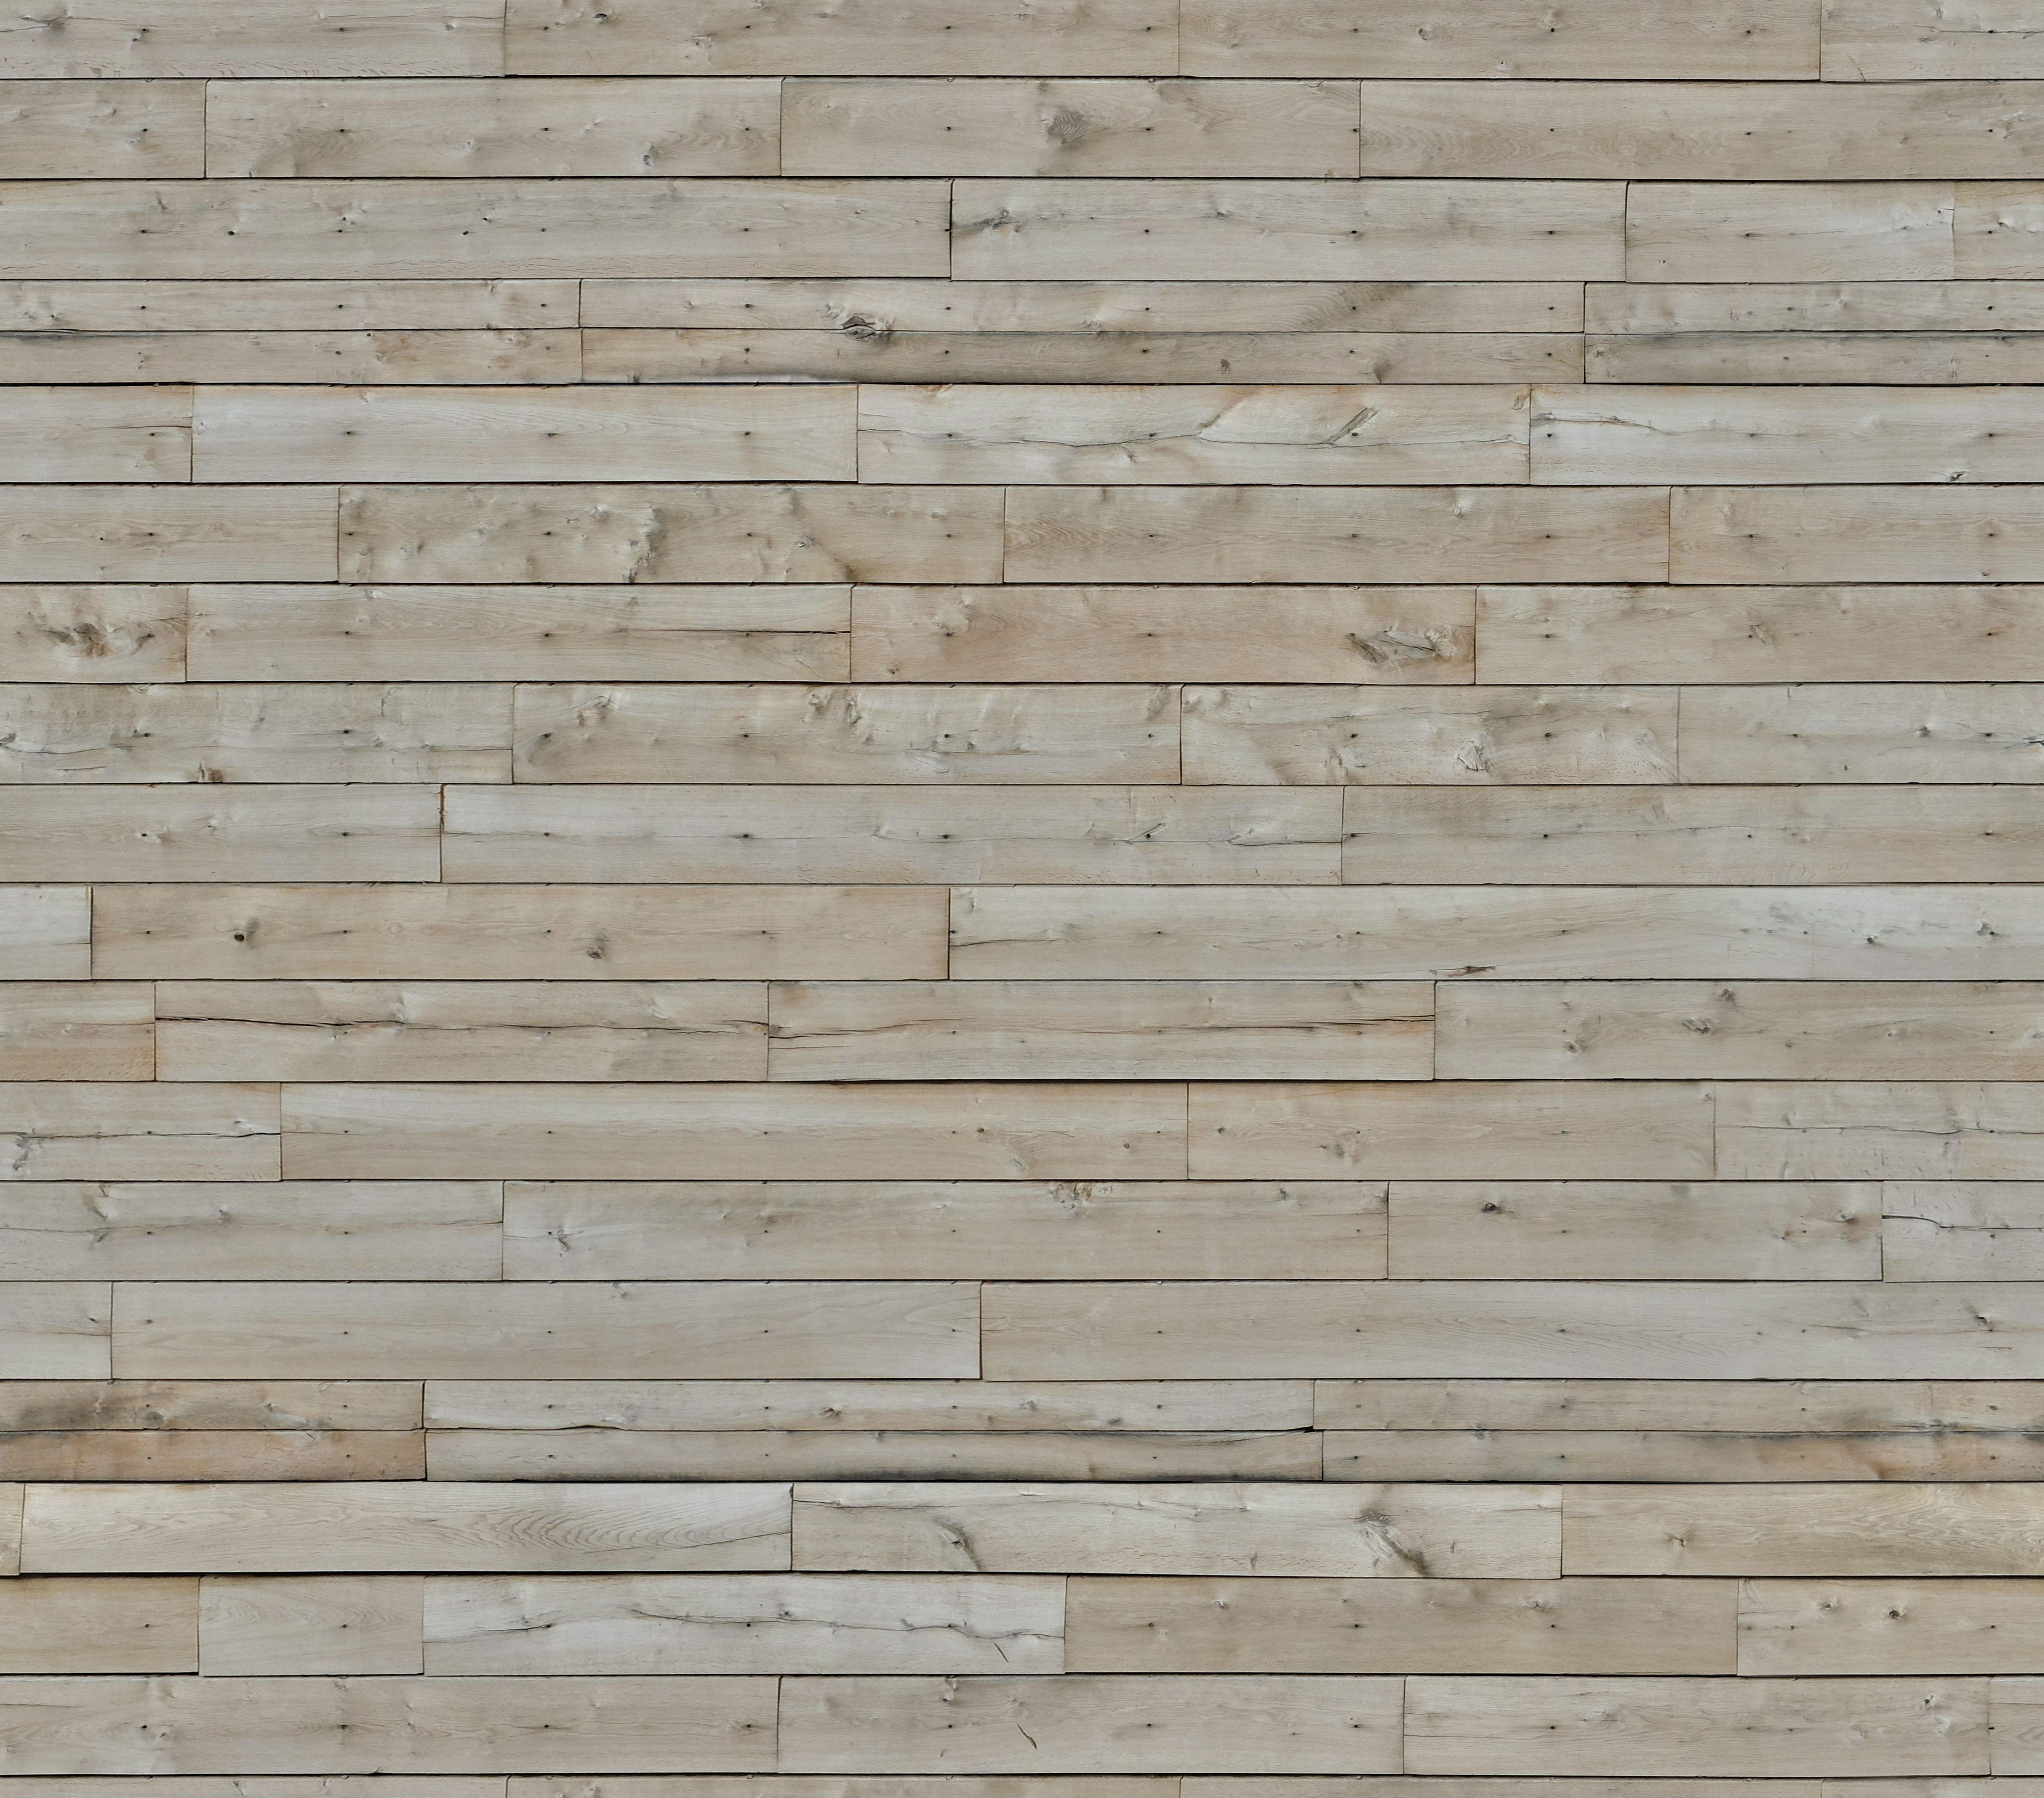 Wooden Sleeper Panel Cladding Seamless Texture Wooden Sleeper